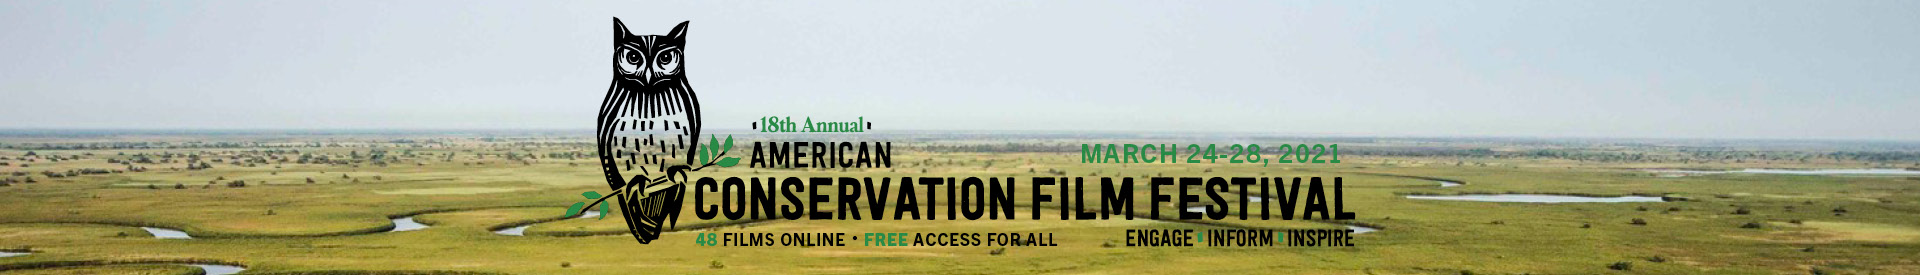 2021 American Conservation Film Festival